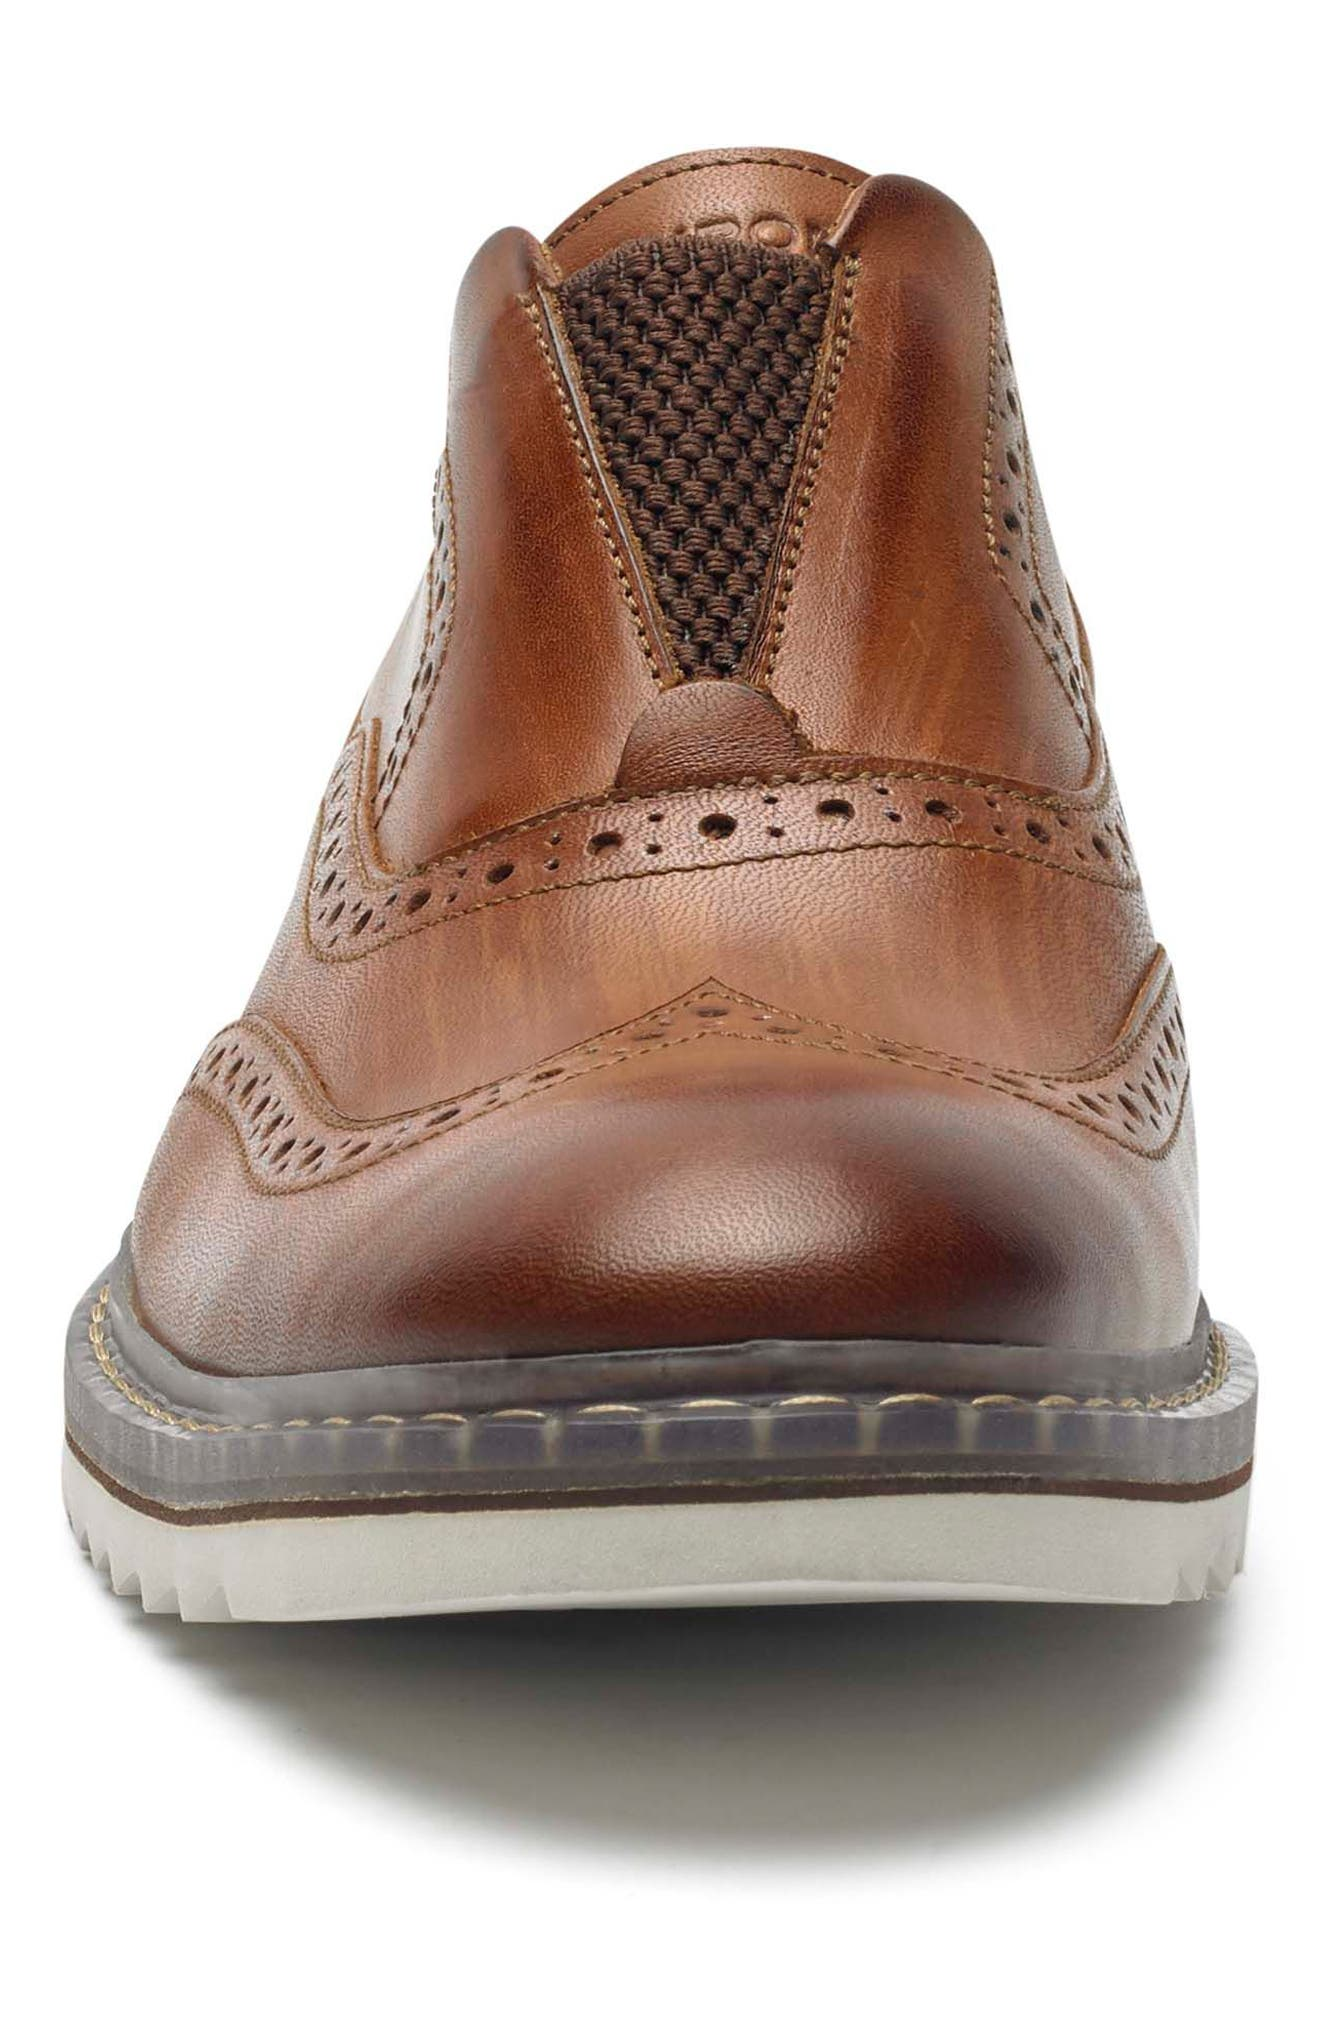 Jaxson Wingtip Slip-On,                             Alternate thumbnail 4, color,                             Tan Leather